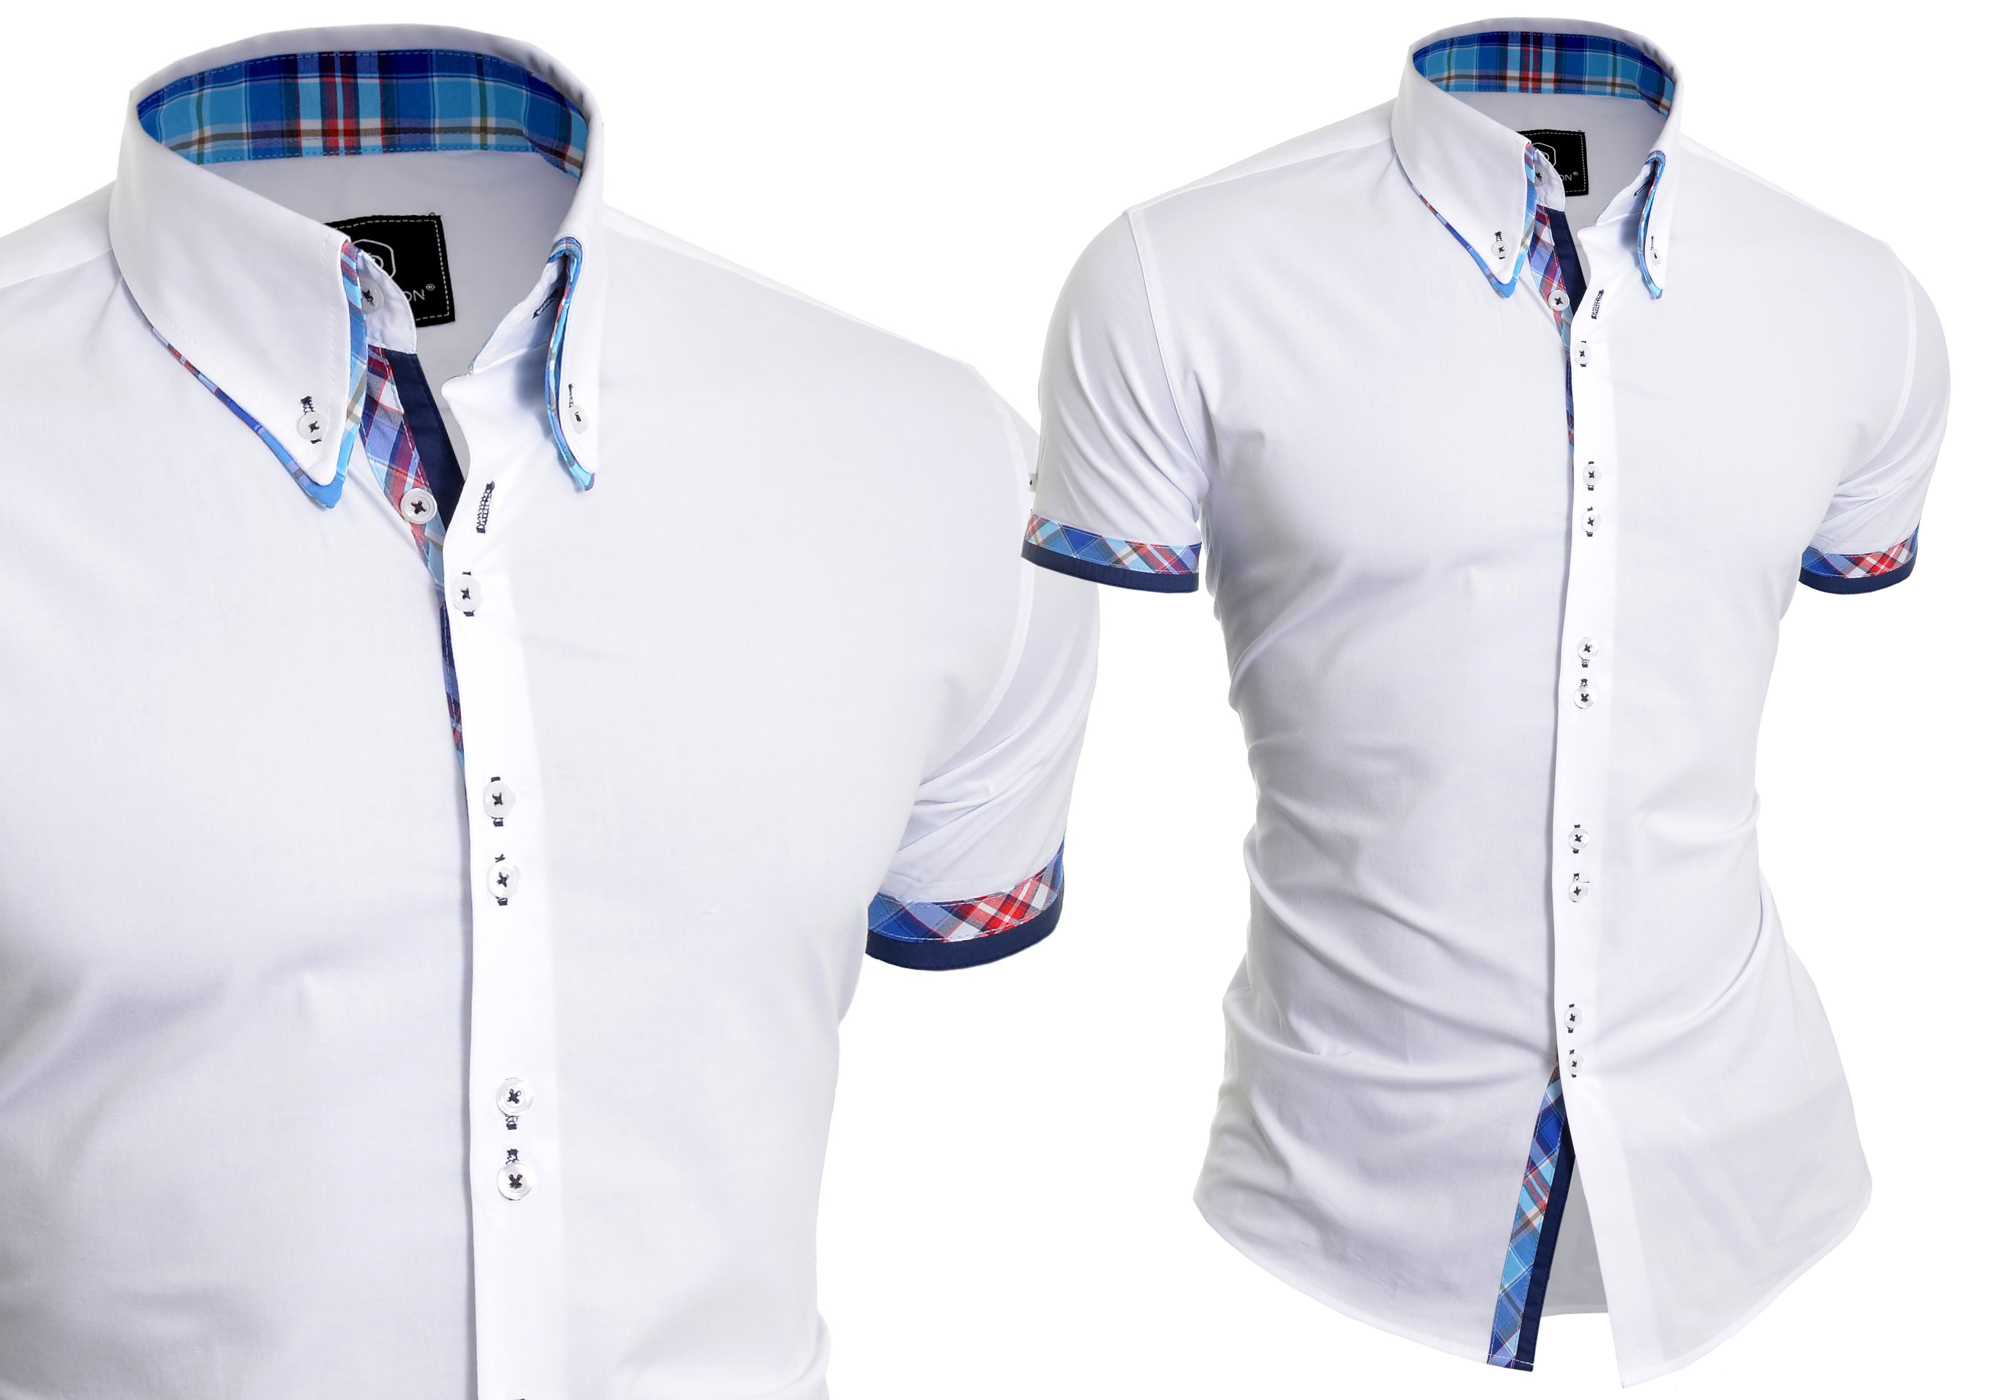 Koszula Męska Elegancka Biała Ślub Prezent Wesele 7415429246